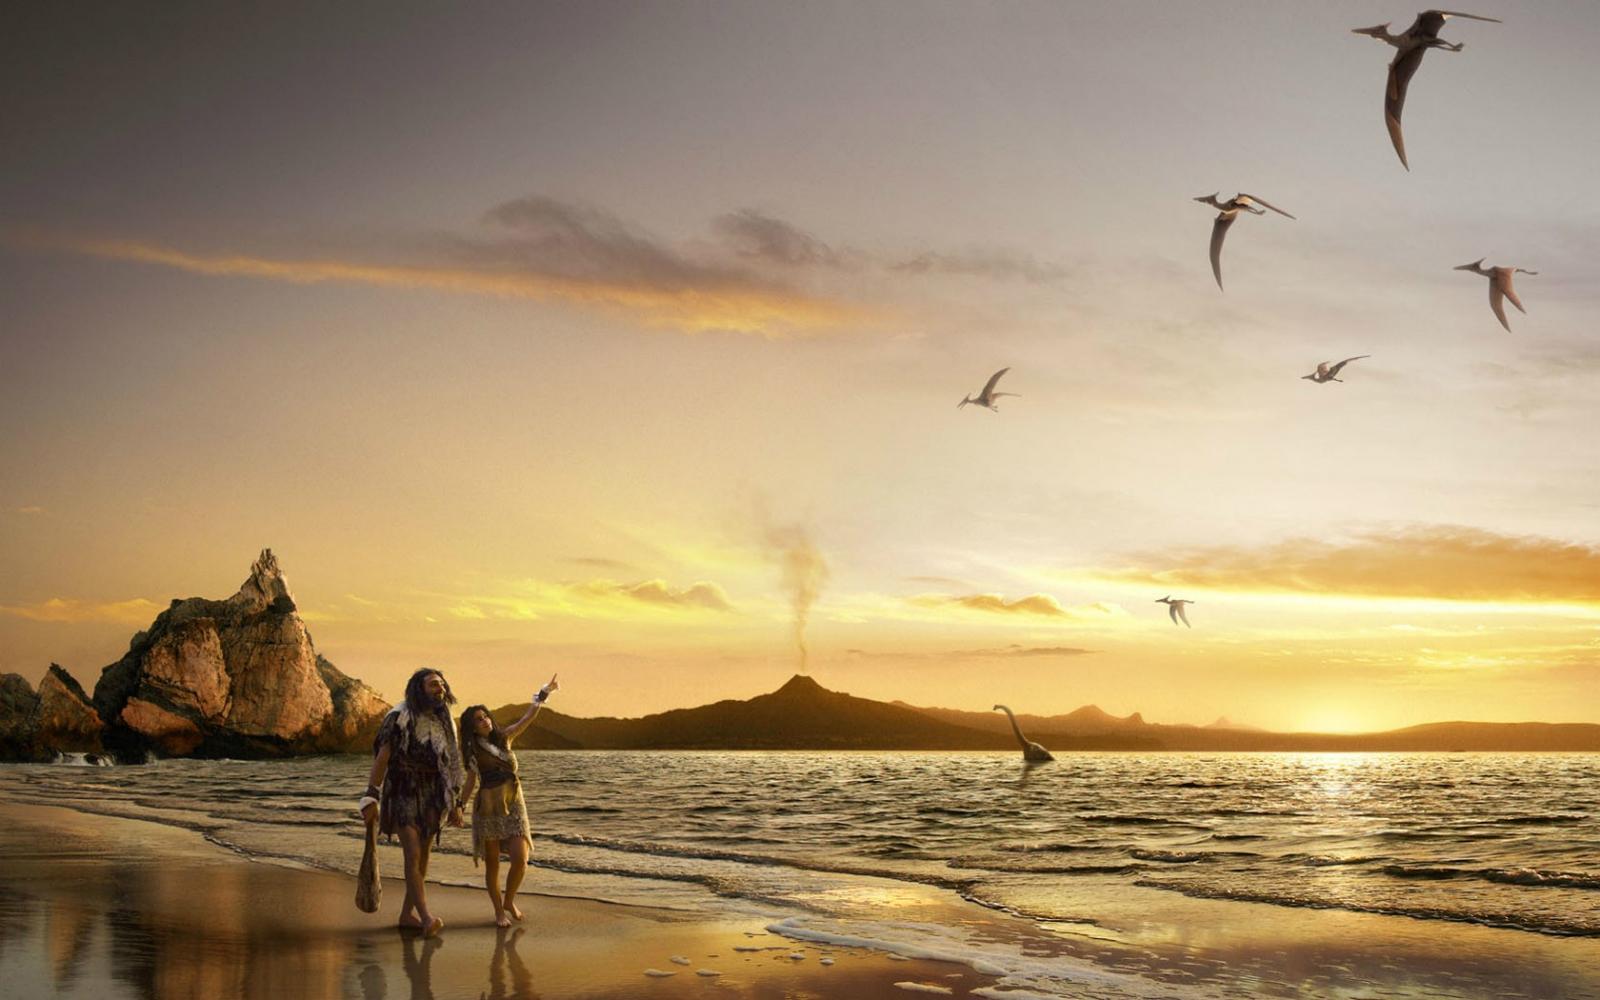 sunset awesome oregon wallpaper - photo #28